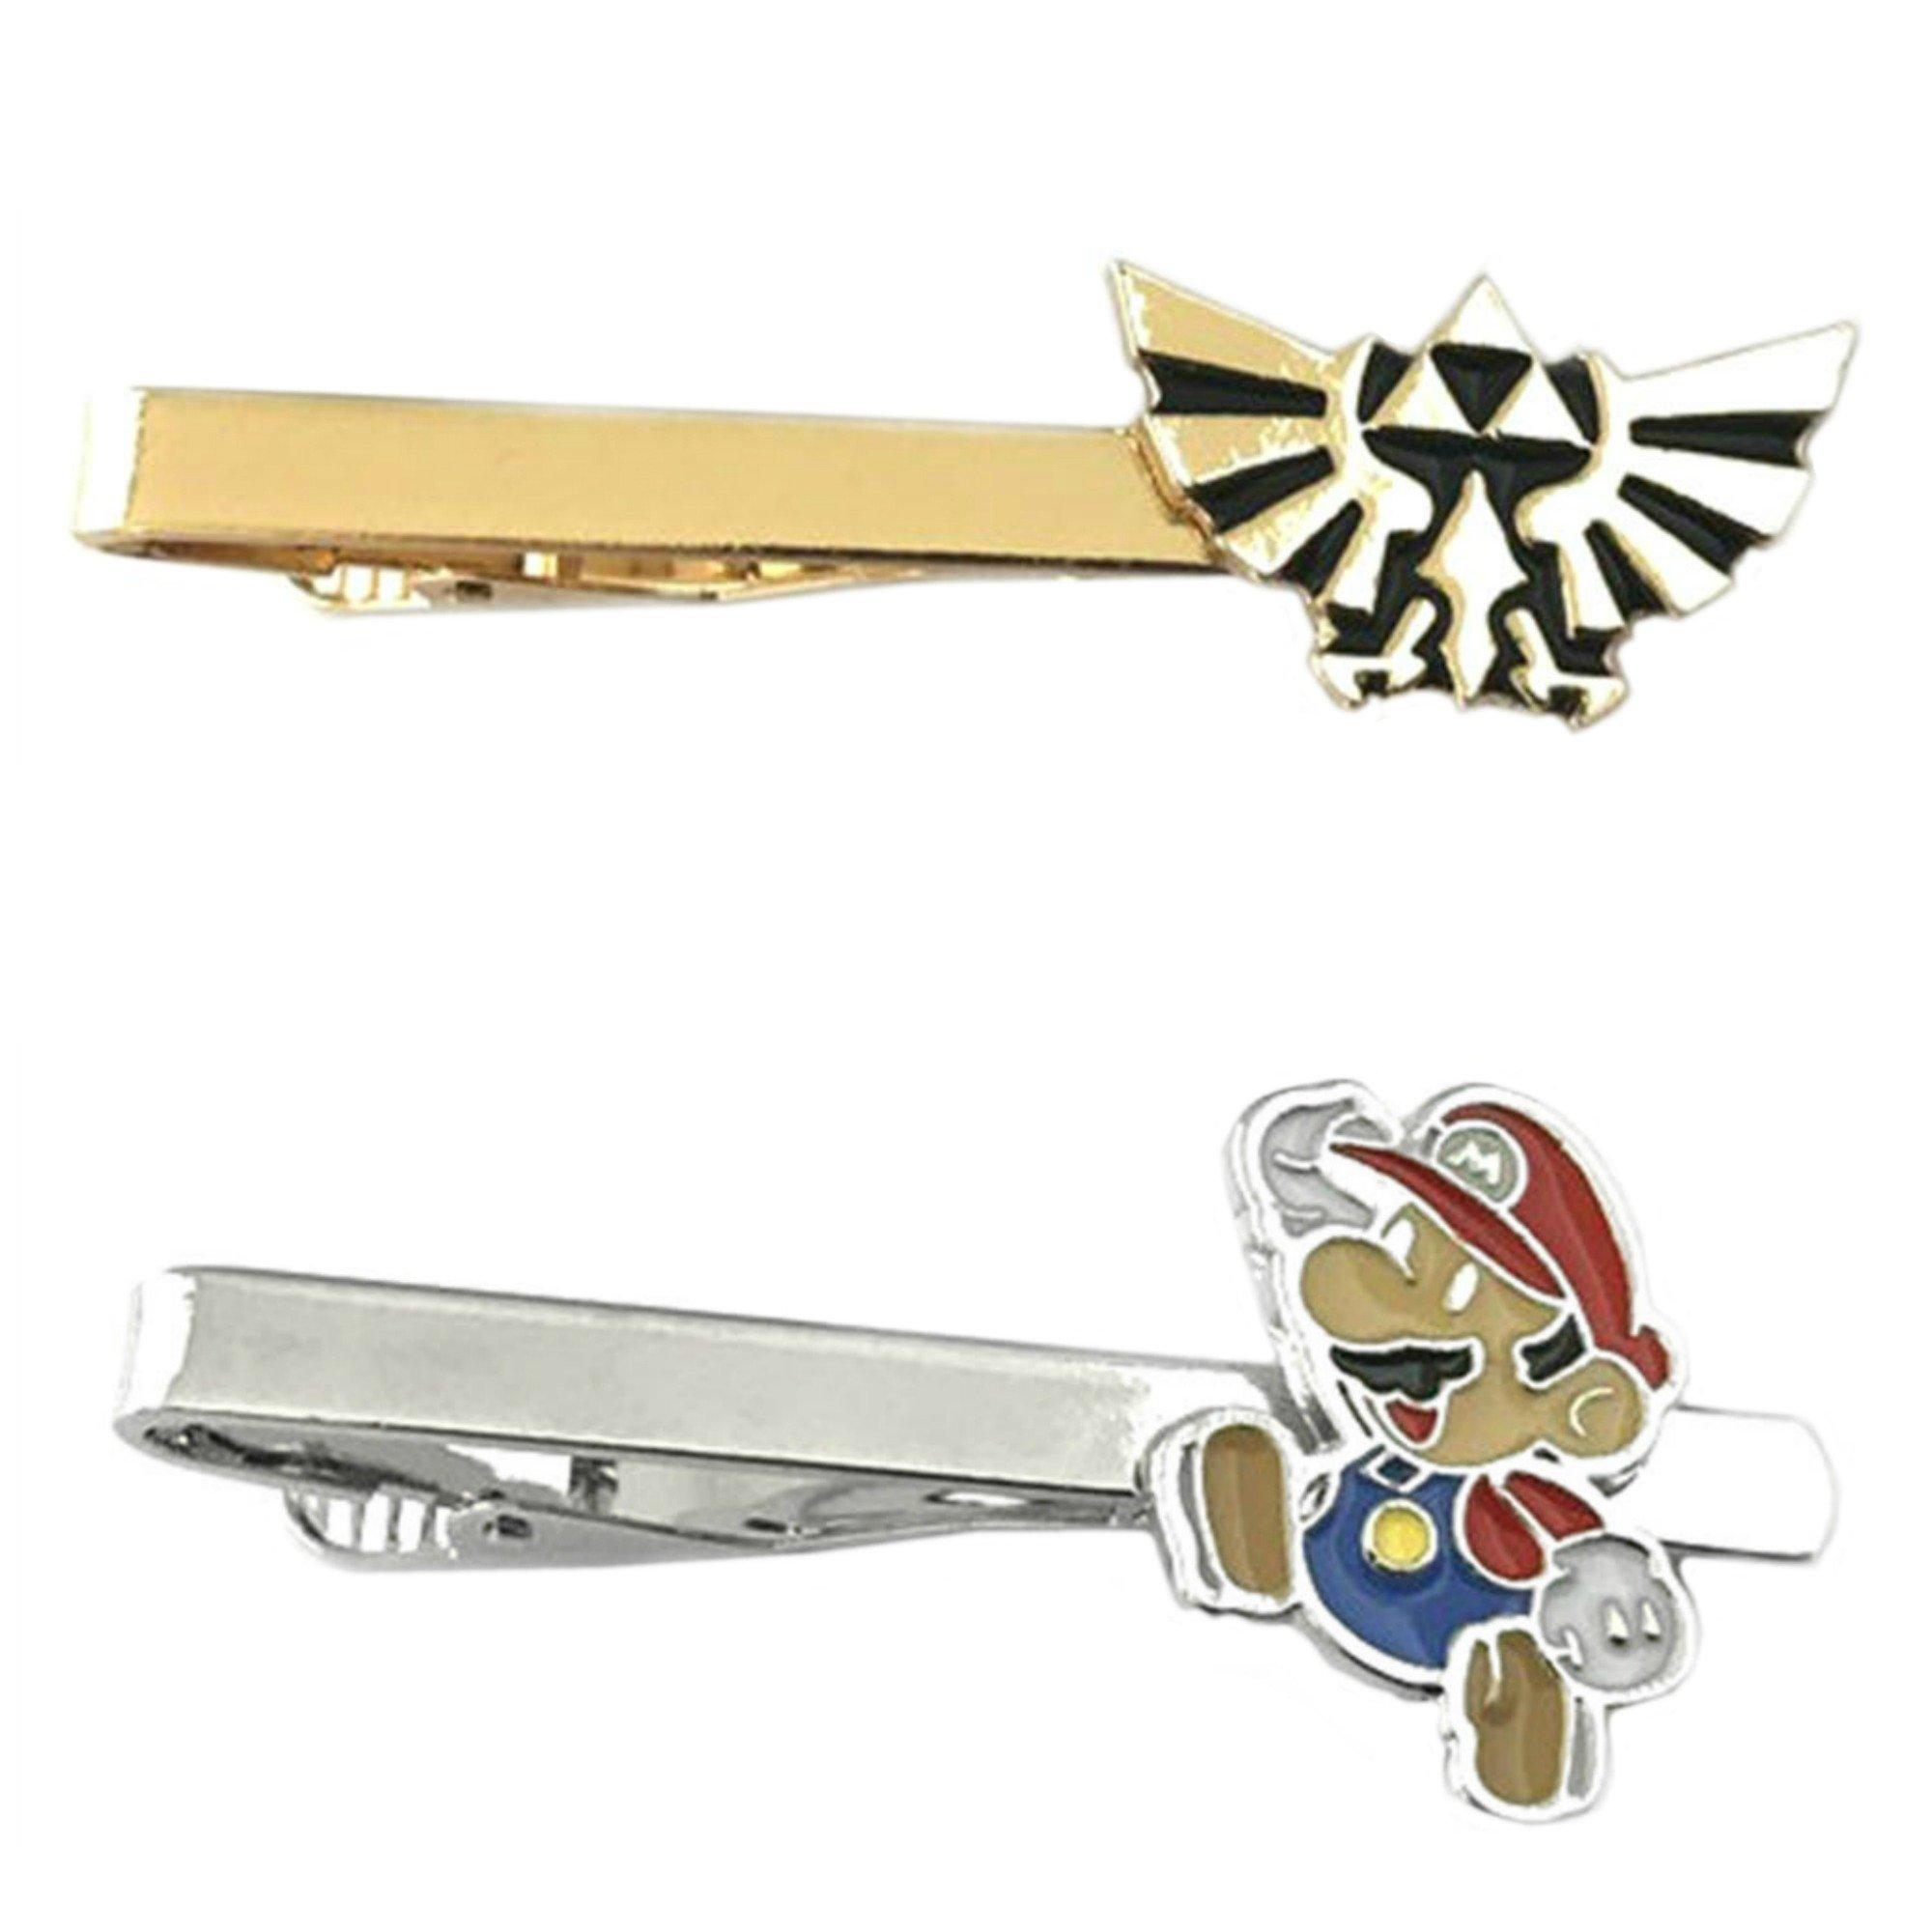 Outlander Video Games - Legend of Zelda Hyrule & Mario's Face - Tiebar Tie Clasp Set of 2 Wedding Superhero Logo w/Gift Box by Outlander